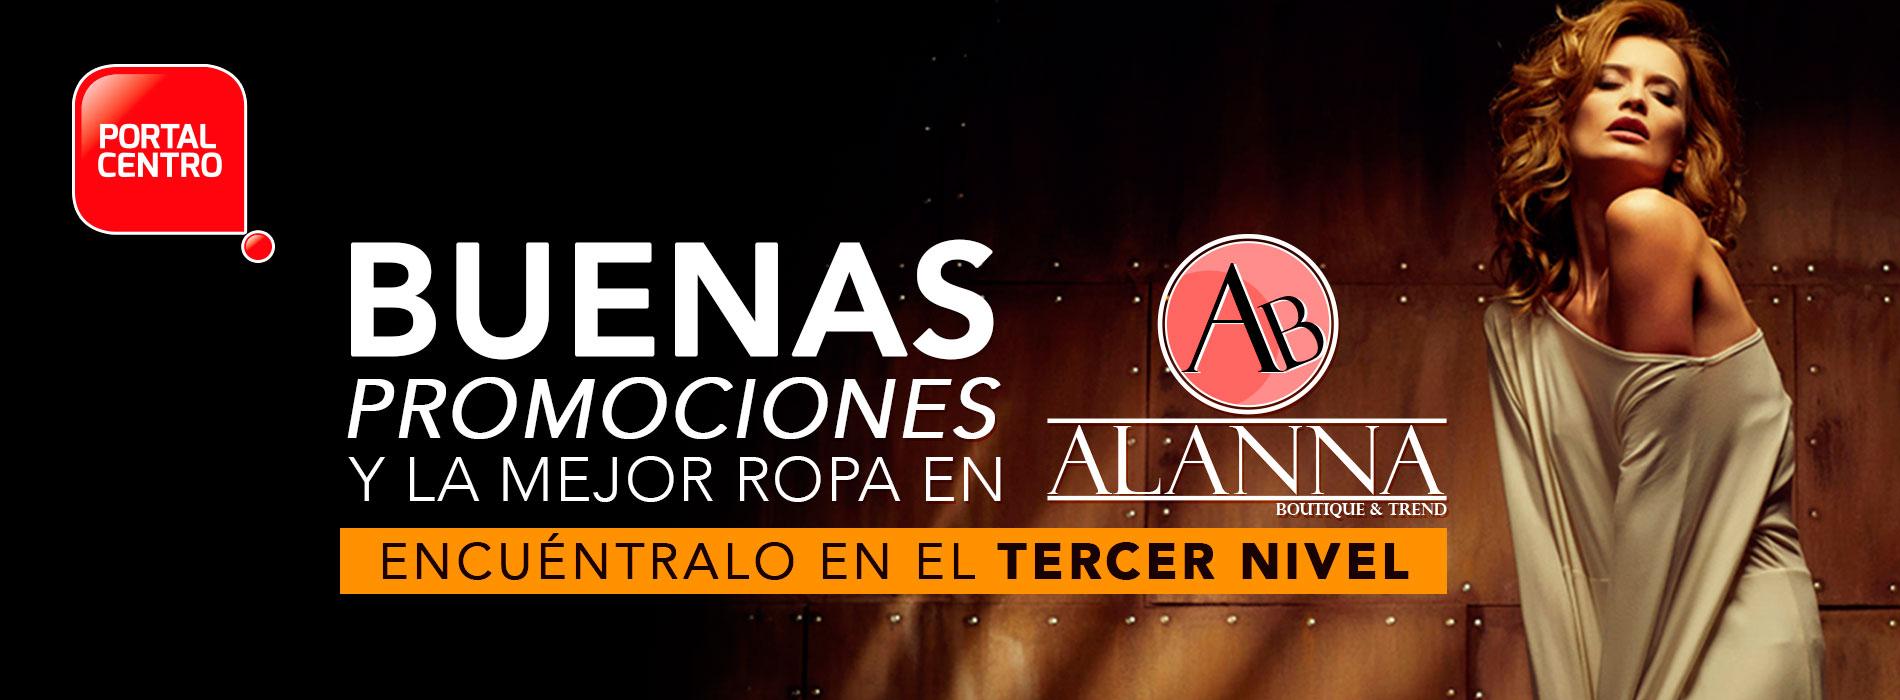 Banner_web_alanna